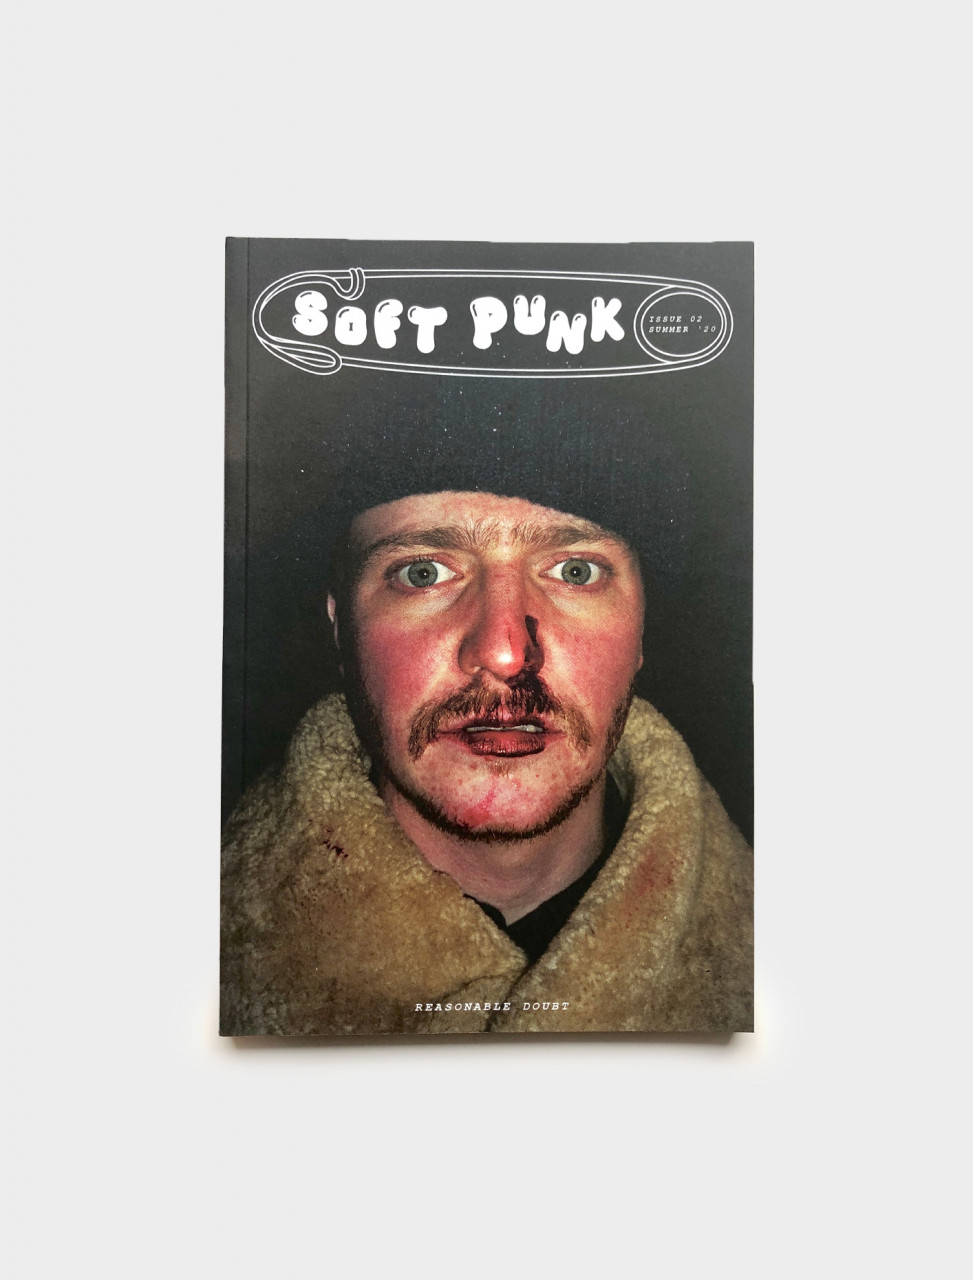 Soft Punk Magazine Issue #02